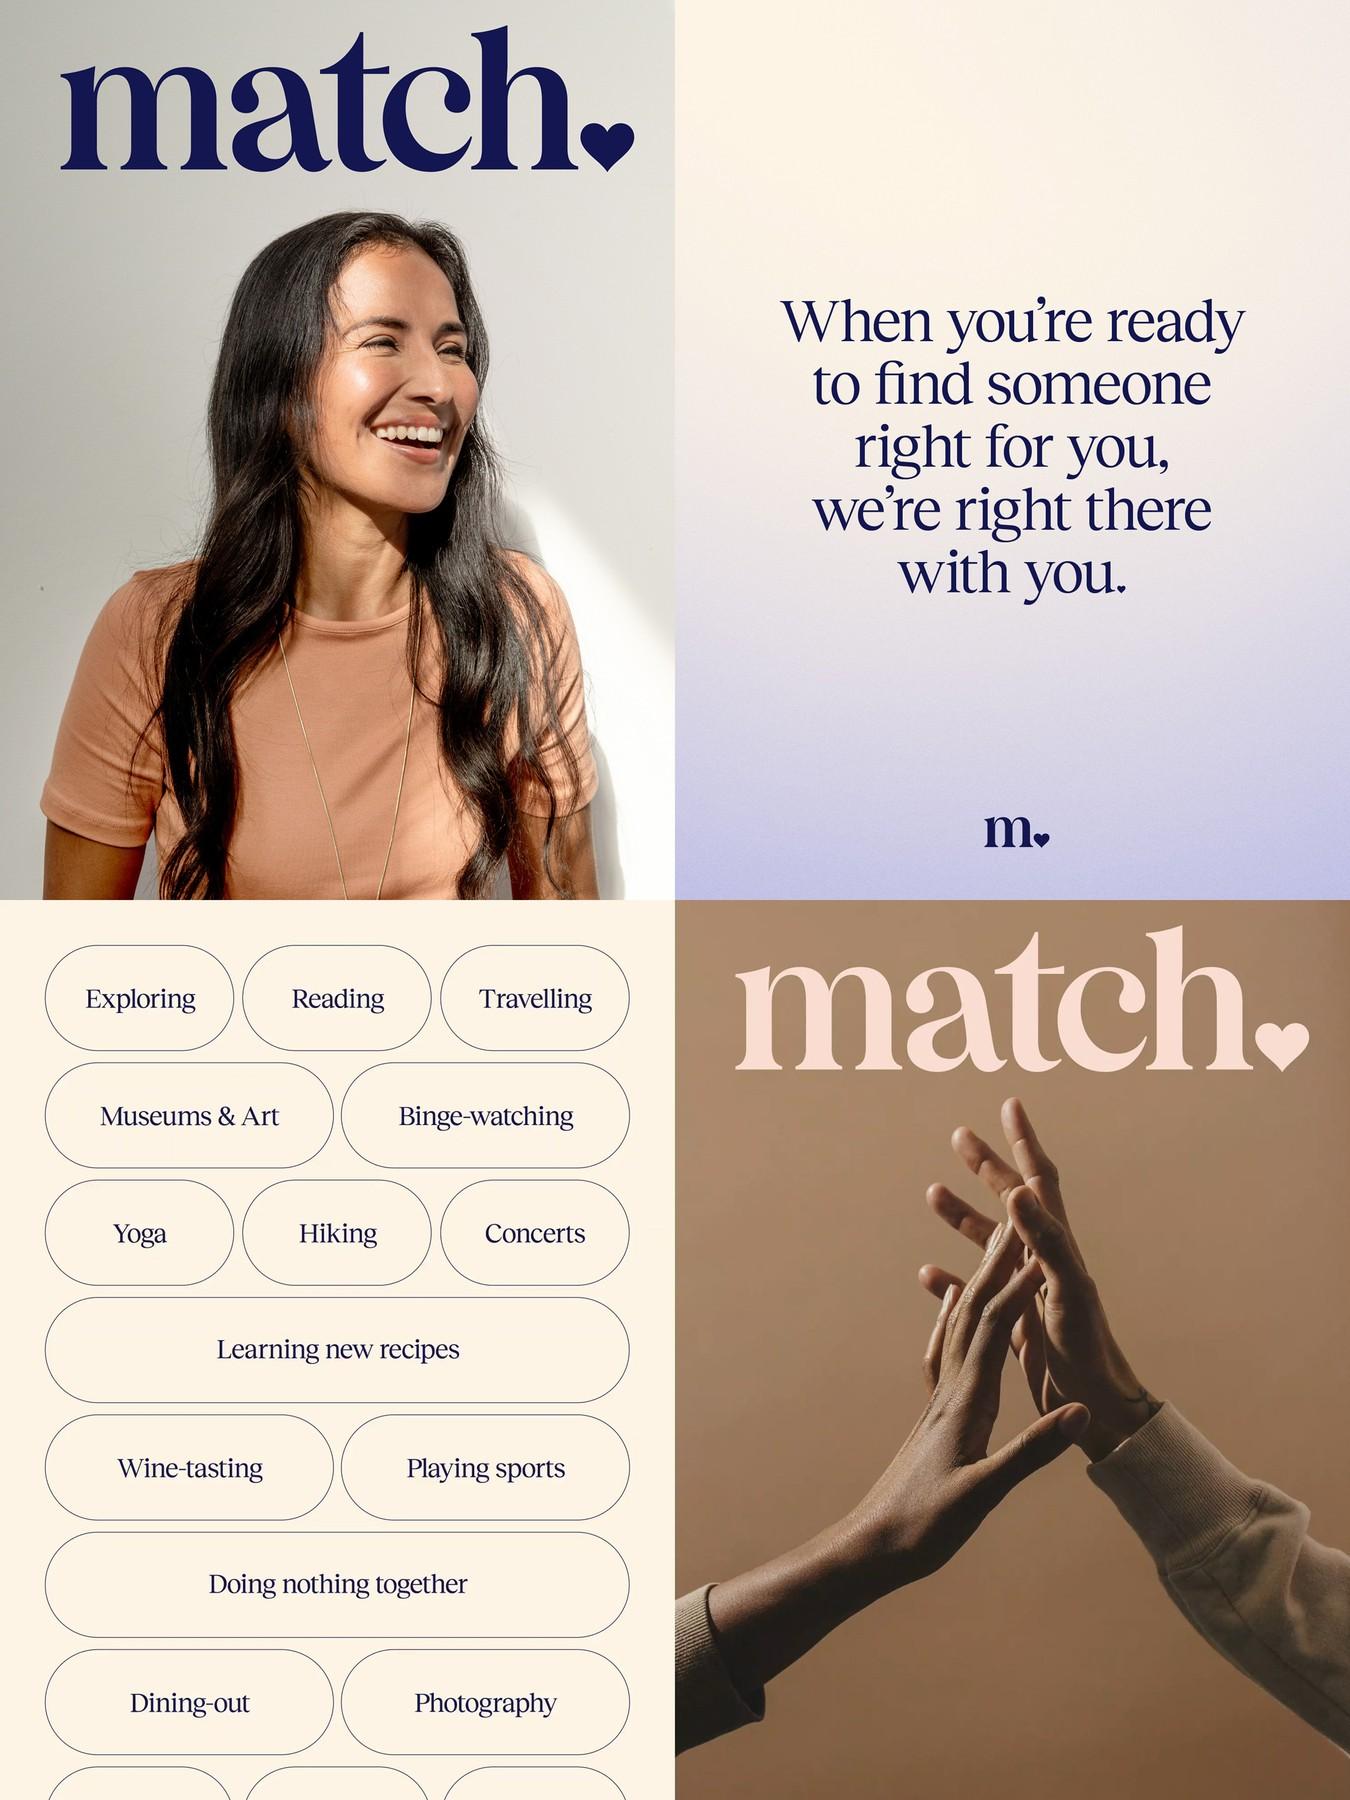 match_logo_and_typography_alt.jpg